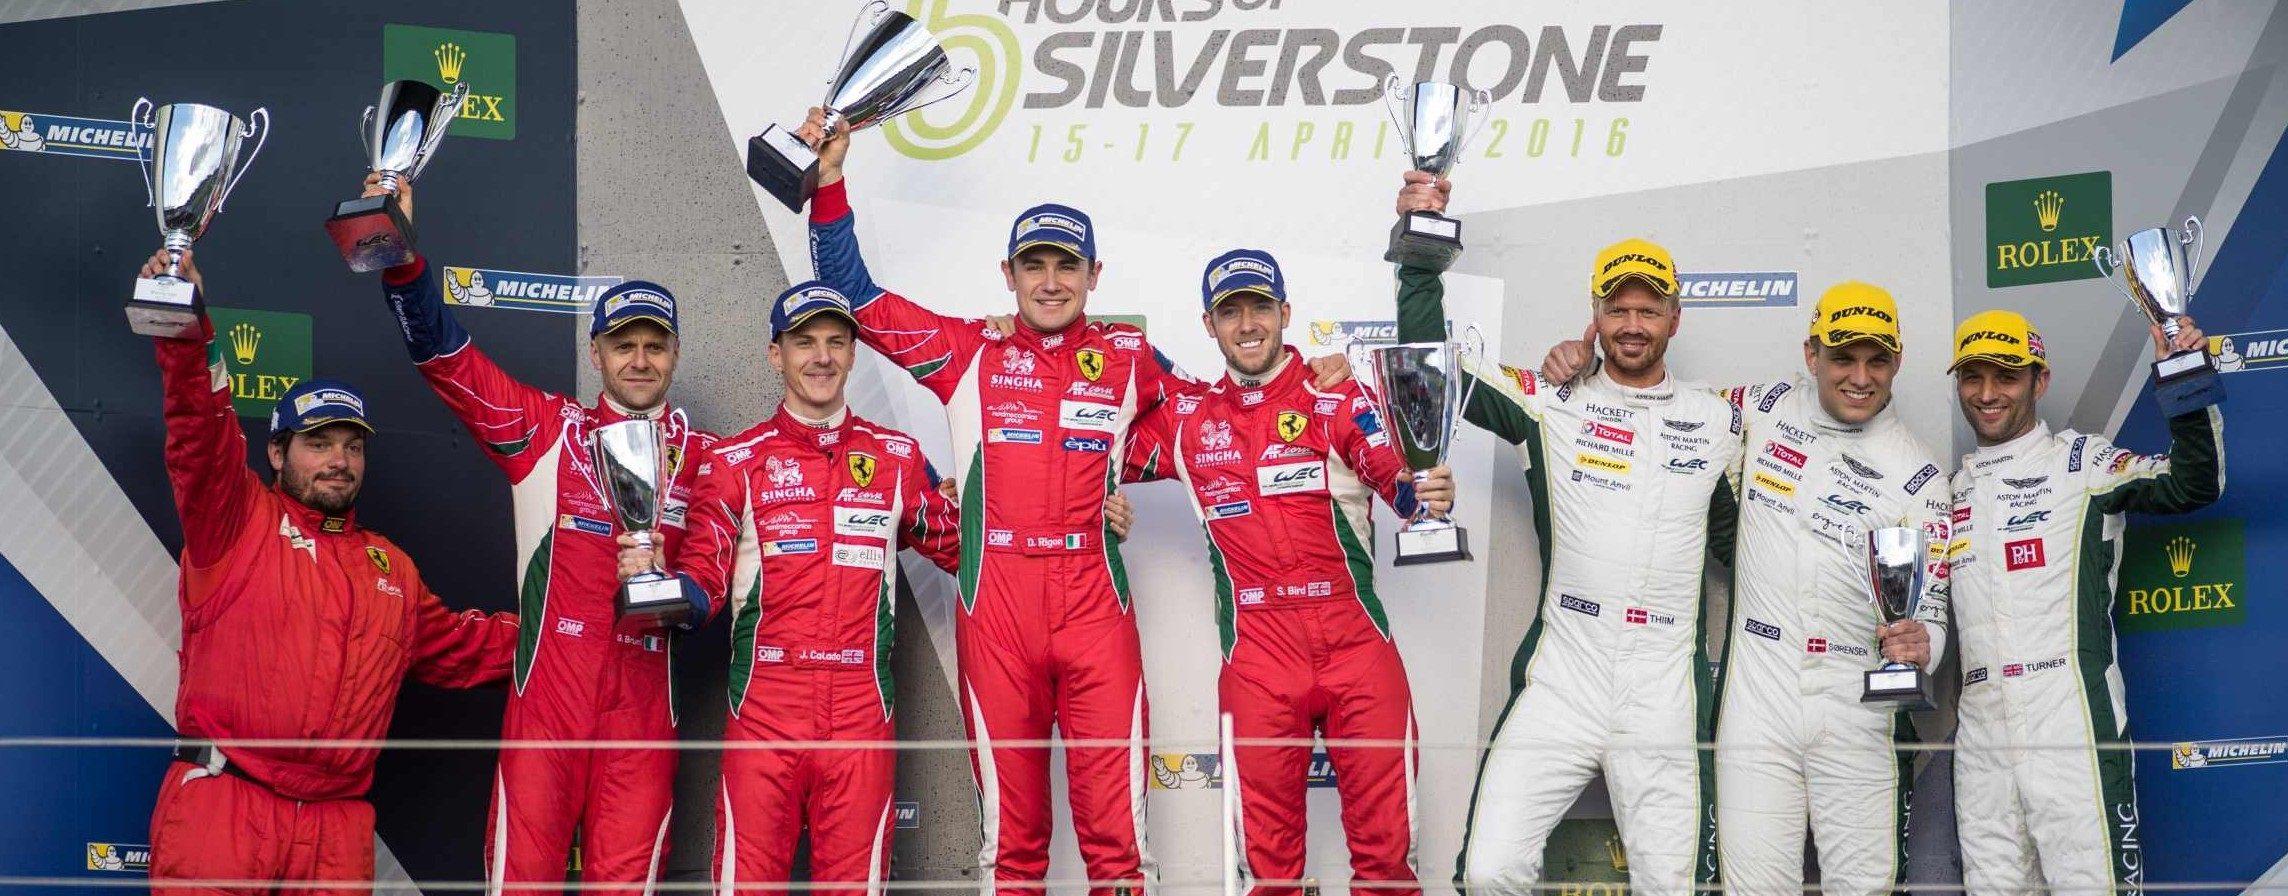 Aston MArtin third place silverstone